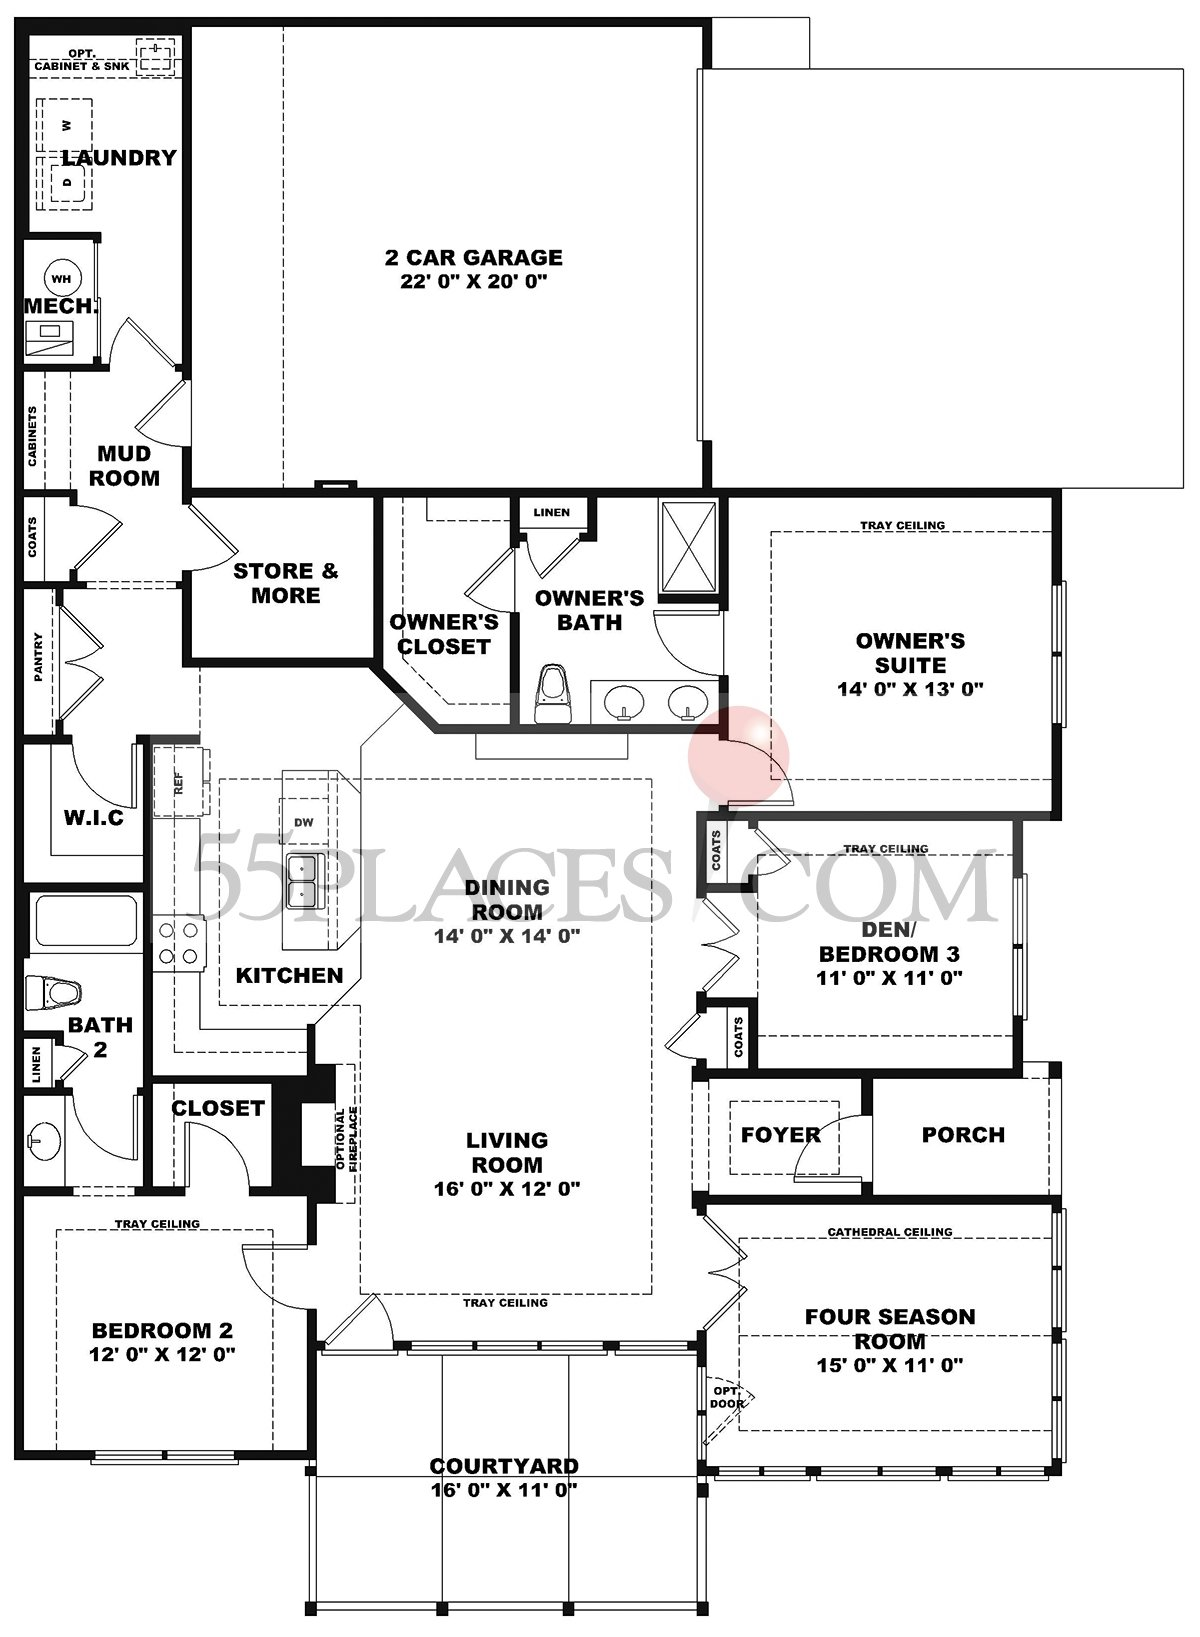 Canterbury Floorplan 1463 Sq Ft Edinburgh Village 55places